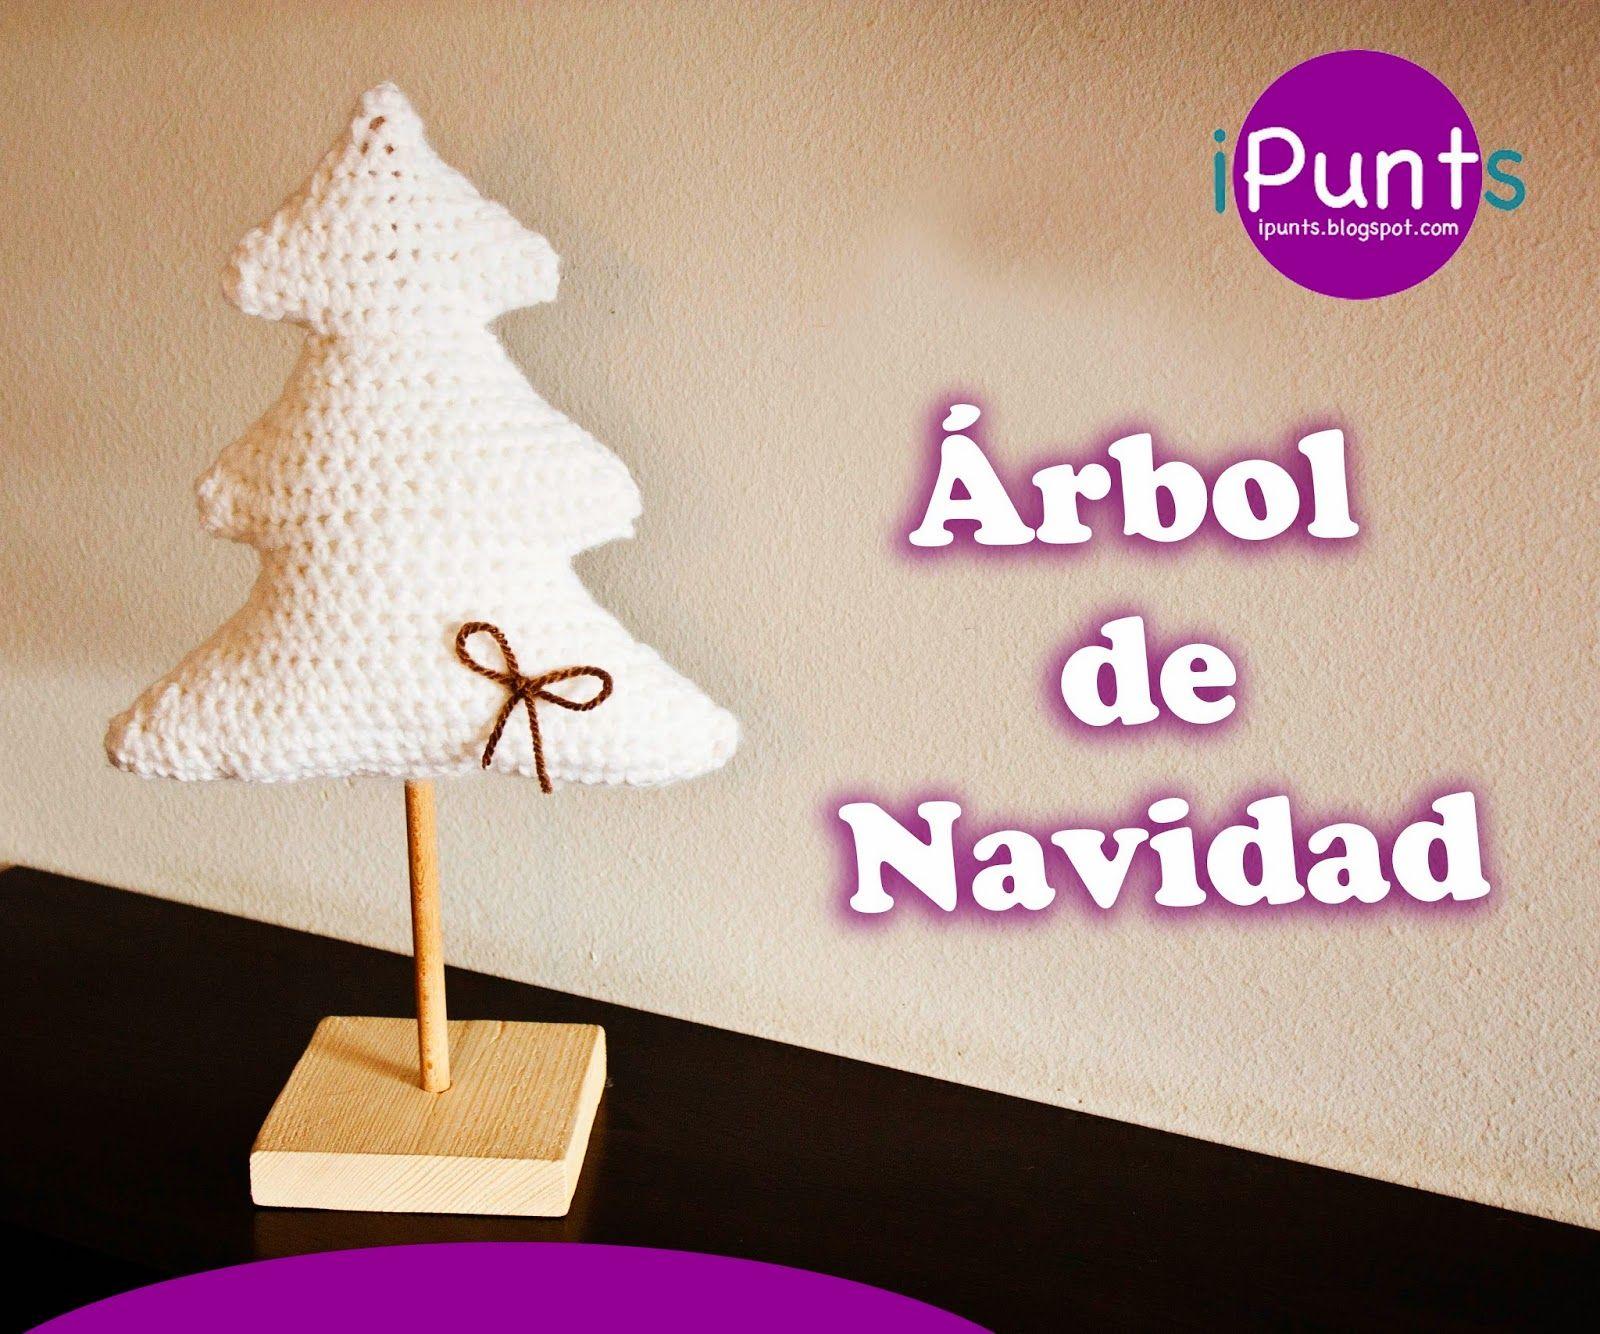 árbol navidad crochet ganchillo ipunts patron gratis fácil paso a ...